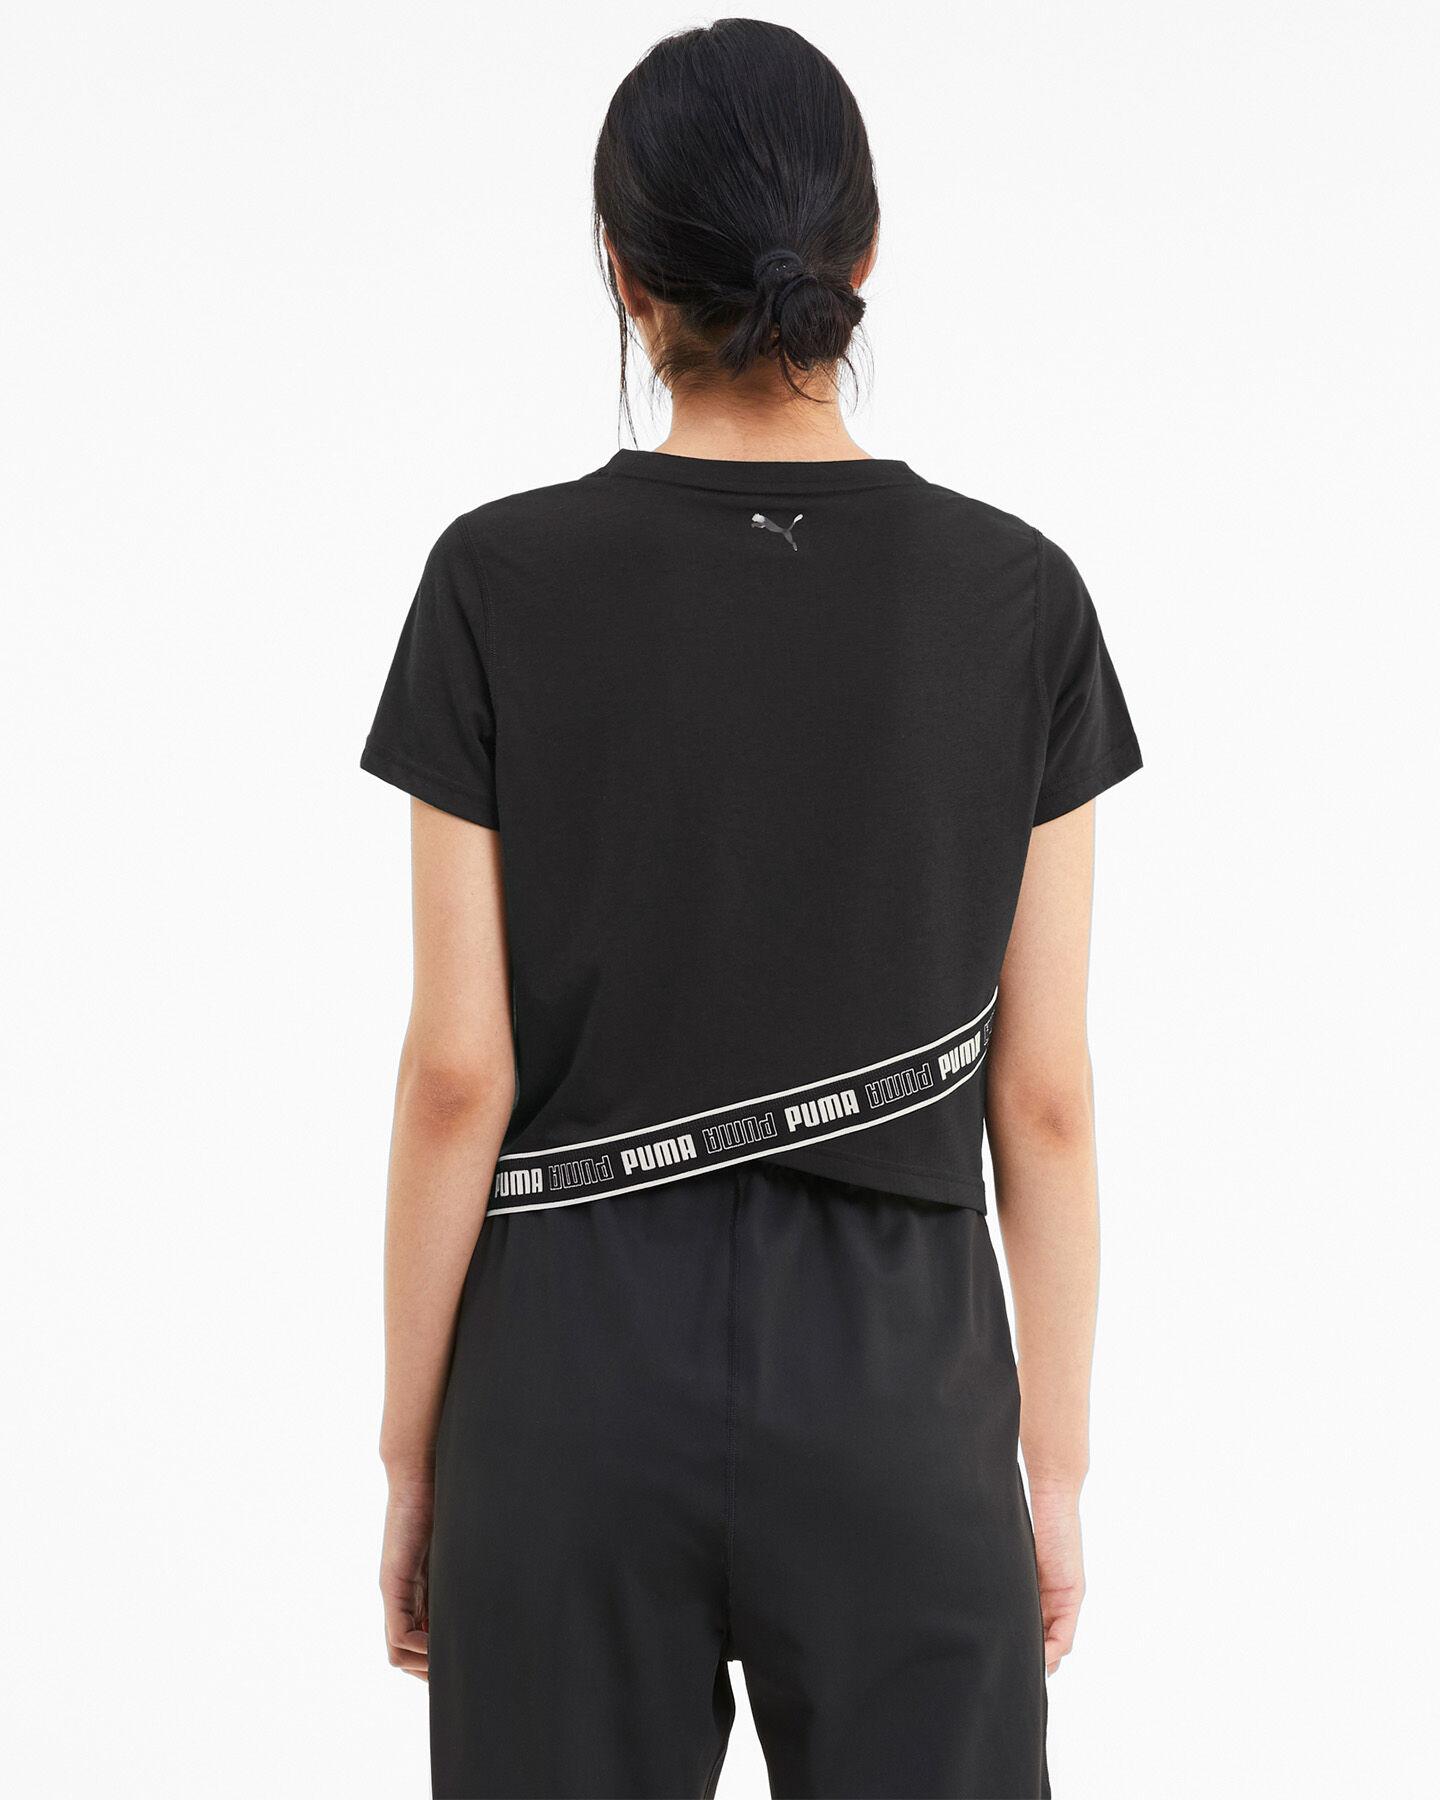 T-Shirt training PUMA DRIFIT CROP LOGO W S5234811 scatto 3